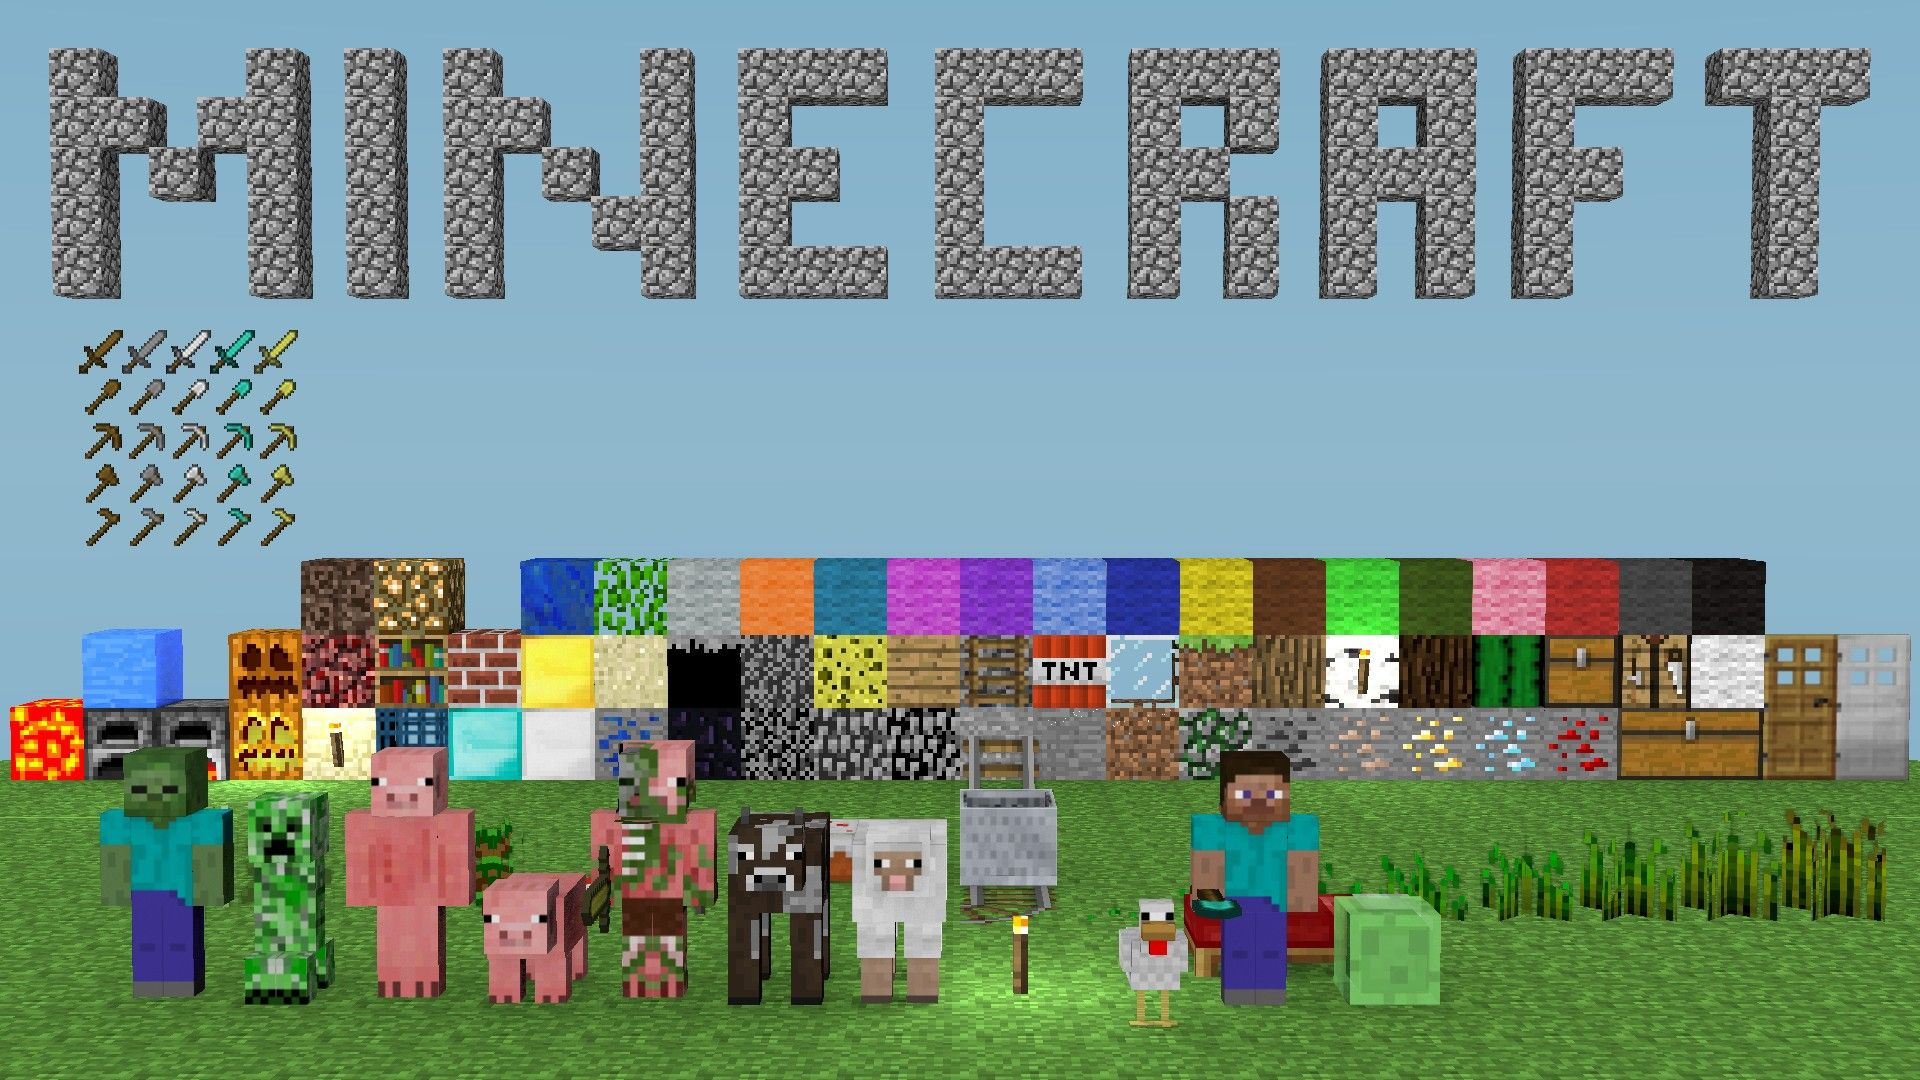 Minecraft Wallpapers For Desktop HD Wallpaper Party Ideas Pinterest - Minecraft block spielen